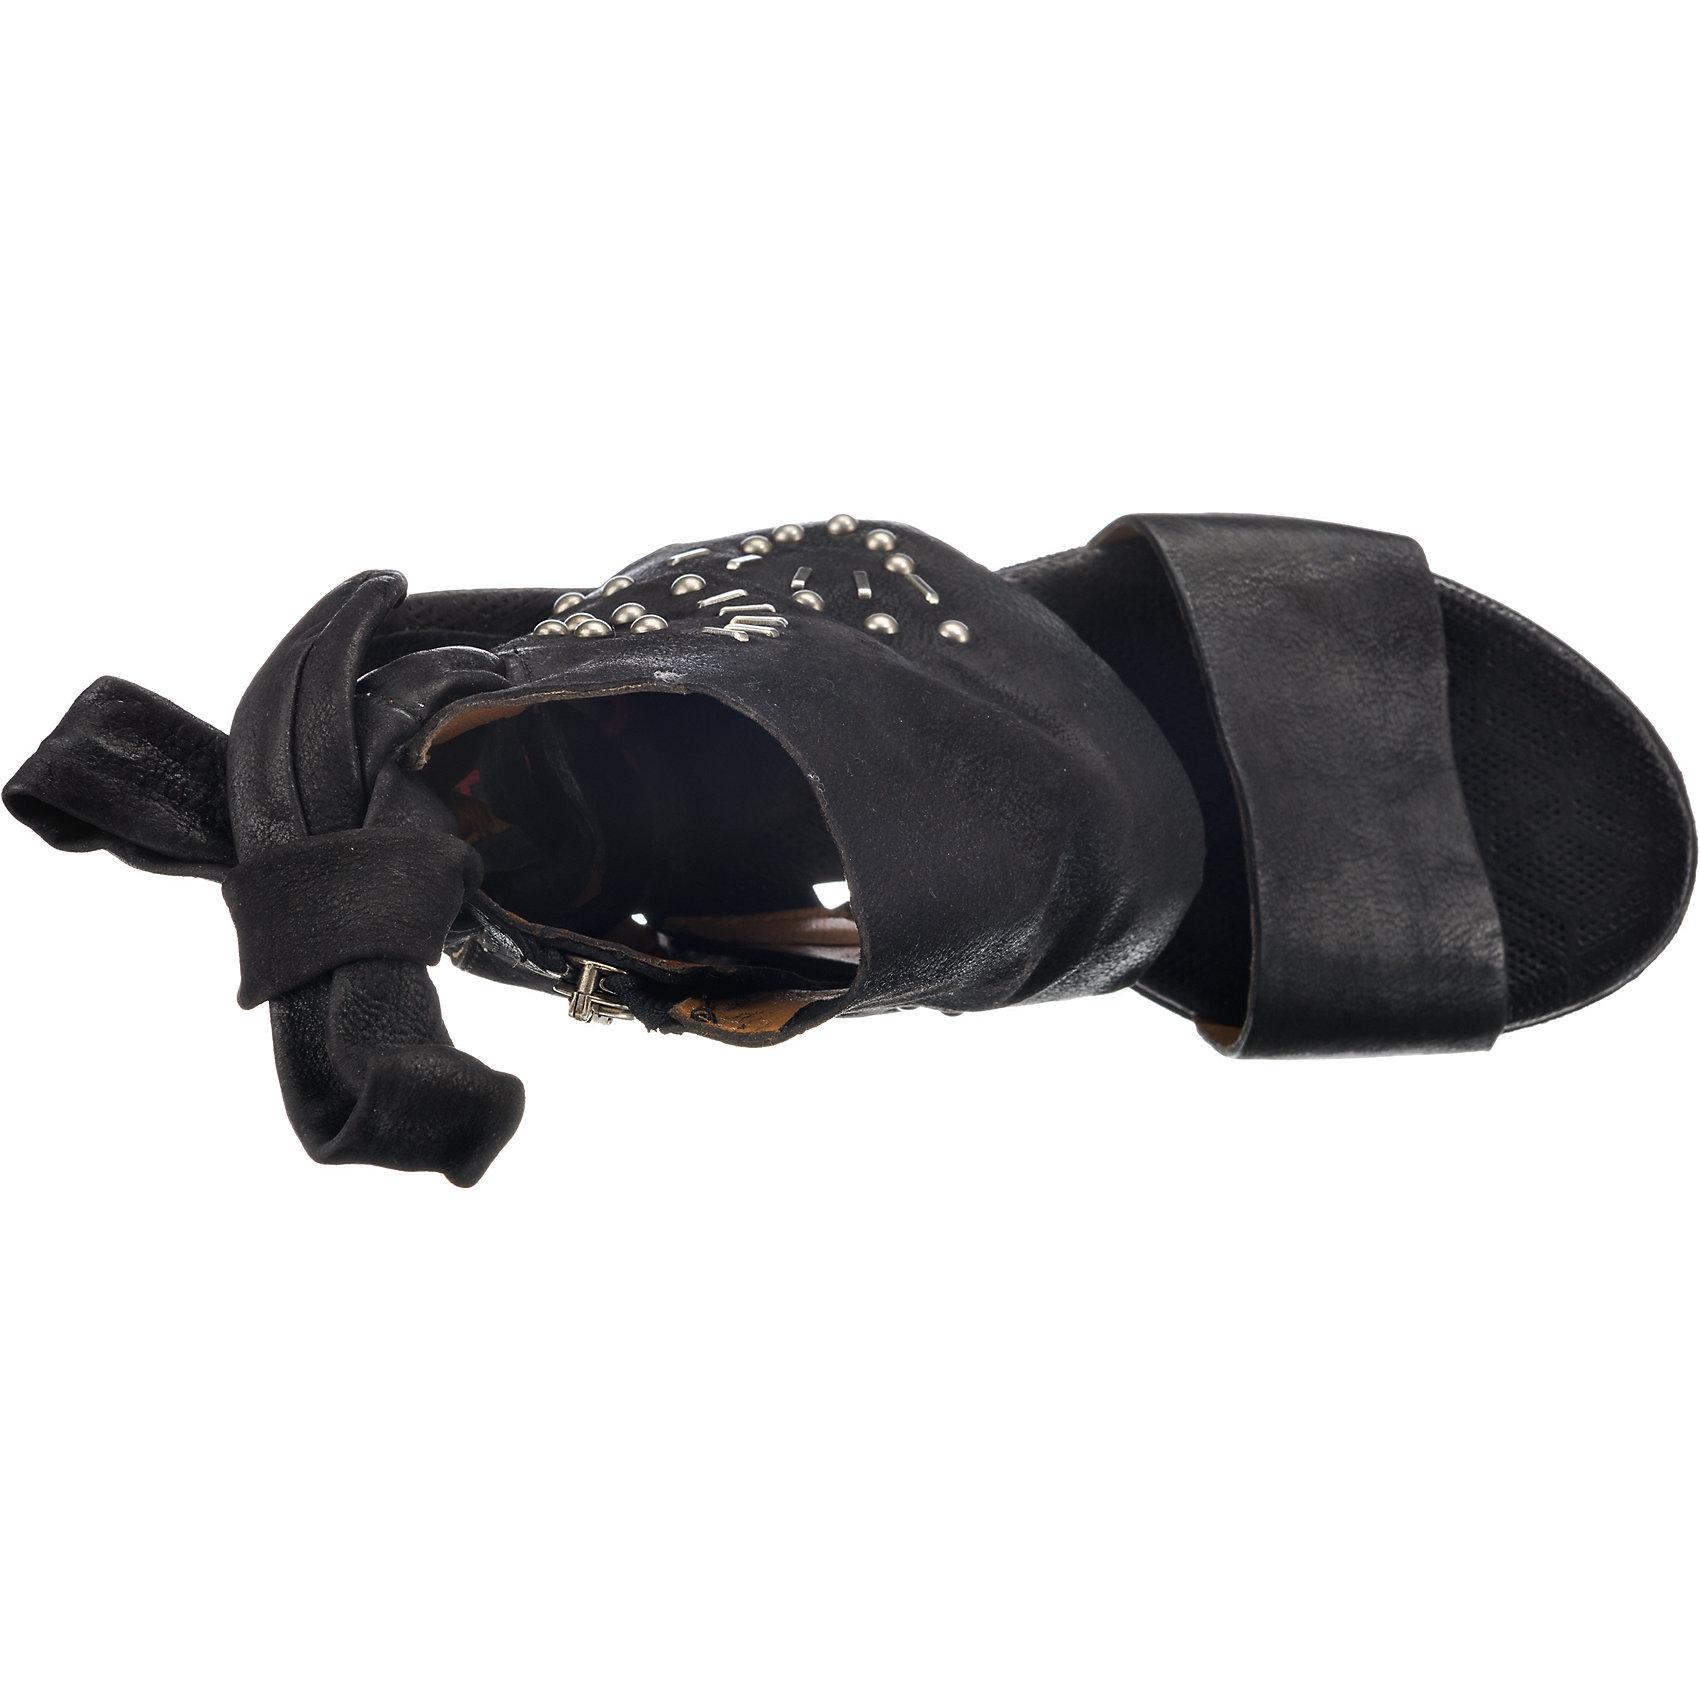 Neu A.S.98 SchaftSandaleetten schwarz 7387896 für Damen schwarz SchaftSandaleetten be7b6d